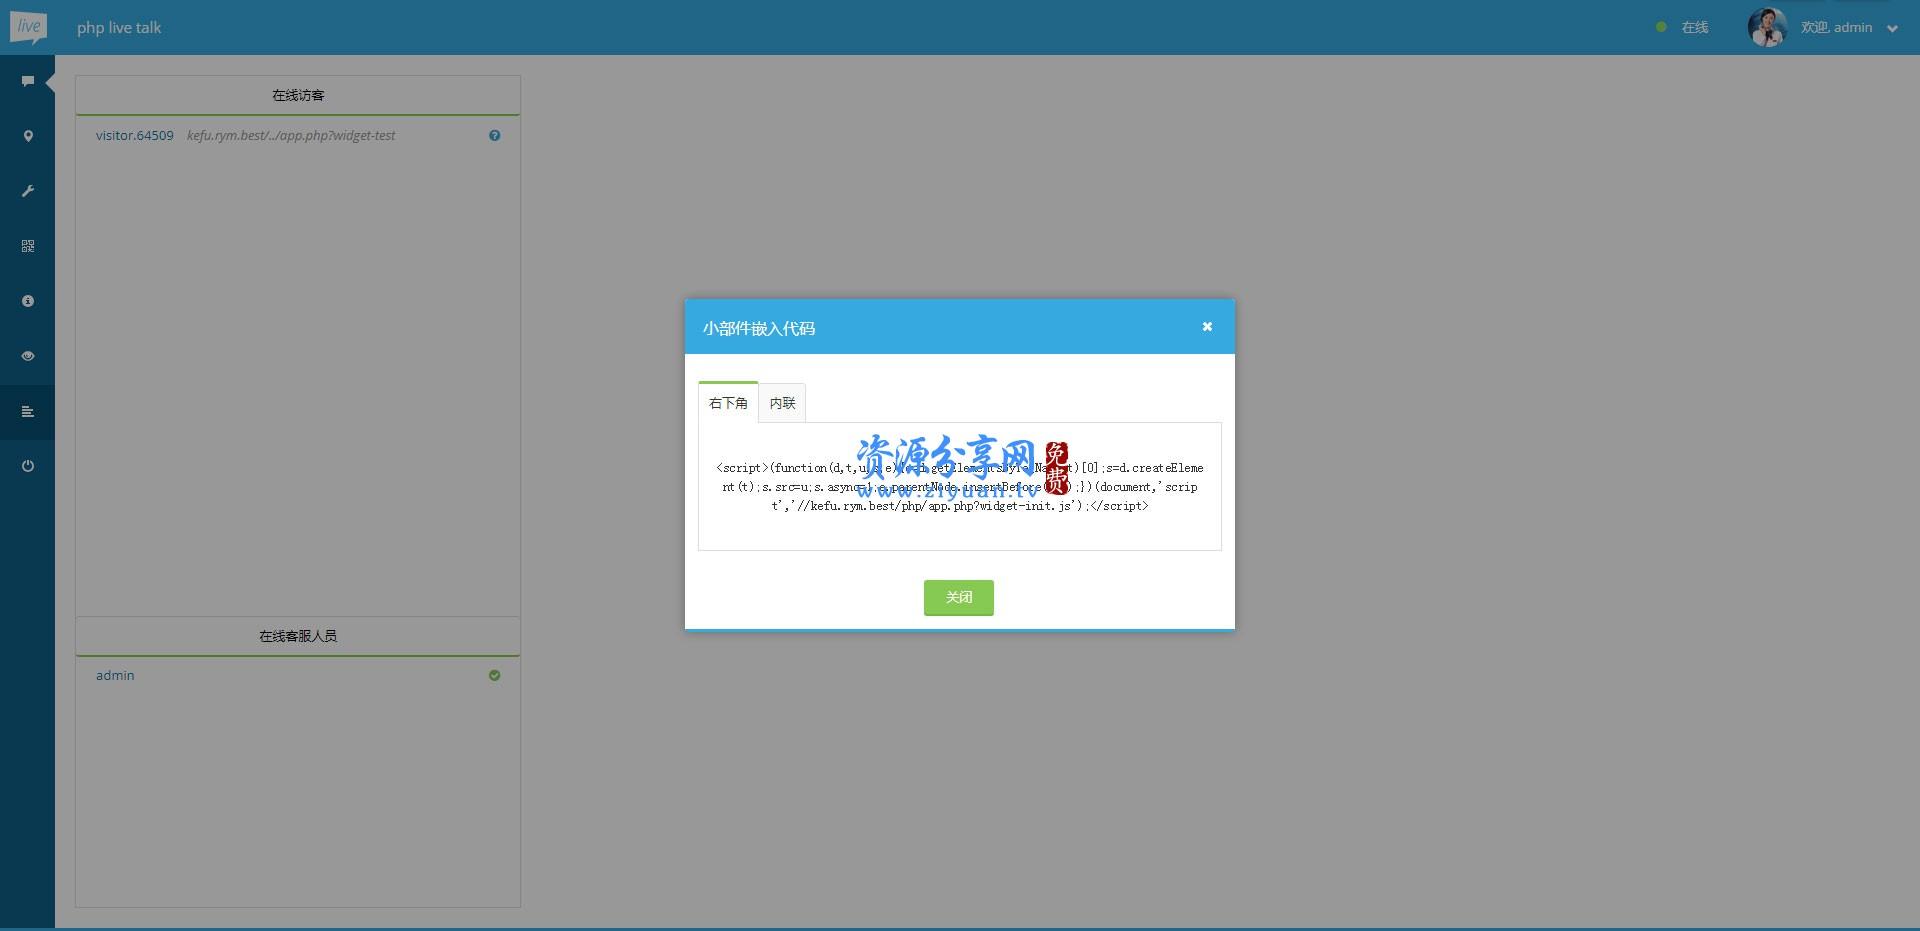 PHP 多坐席客服聊天系统 完美定制版+手机自适应网页单独聊天+PC 端右下角弹窗+带原生 APP